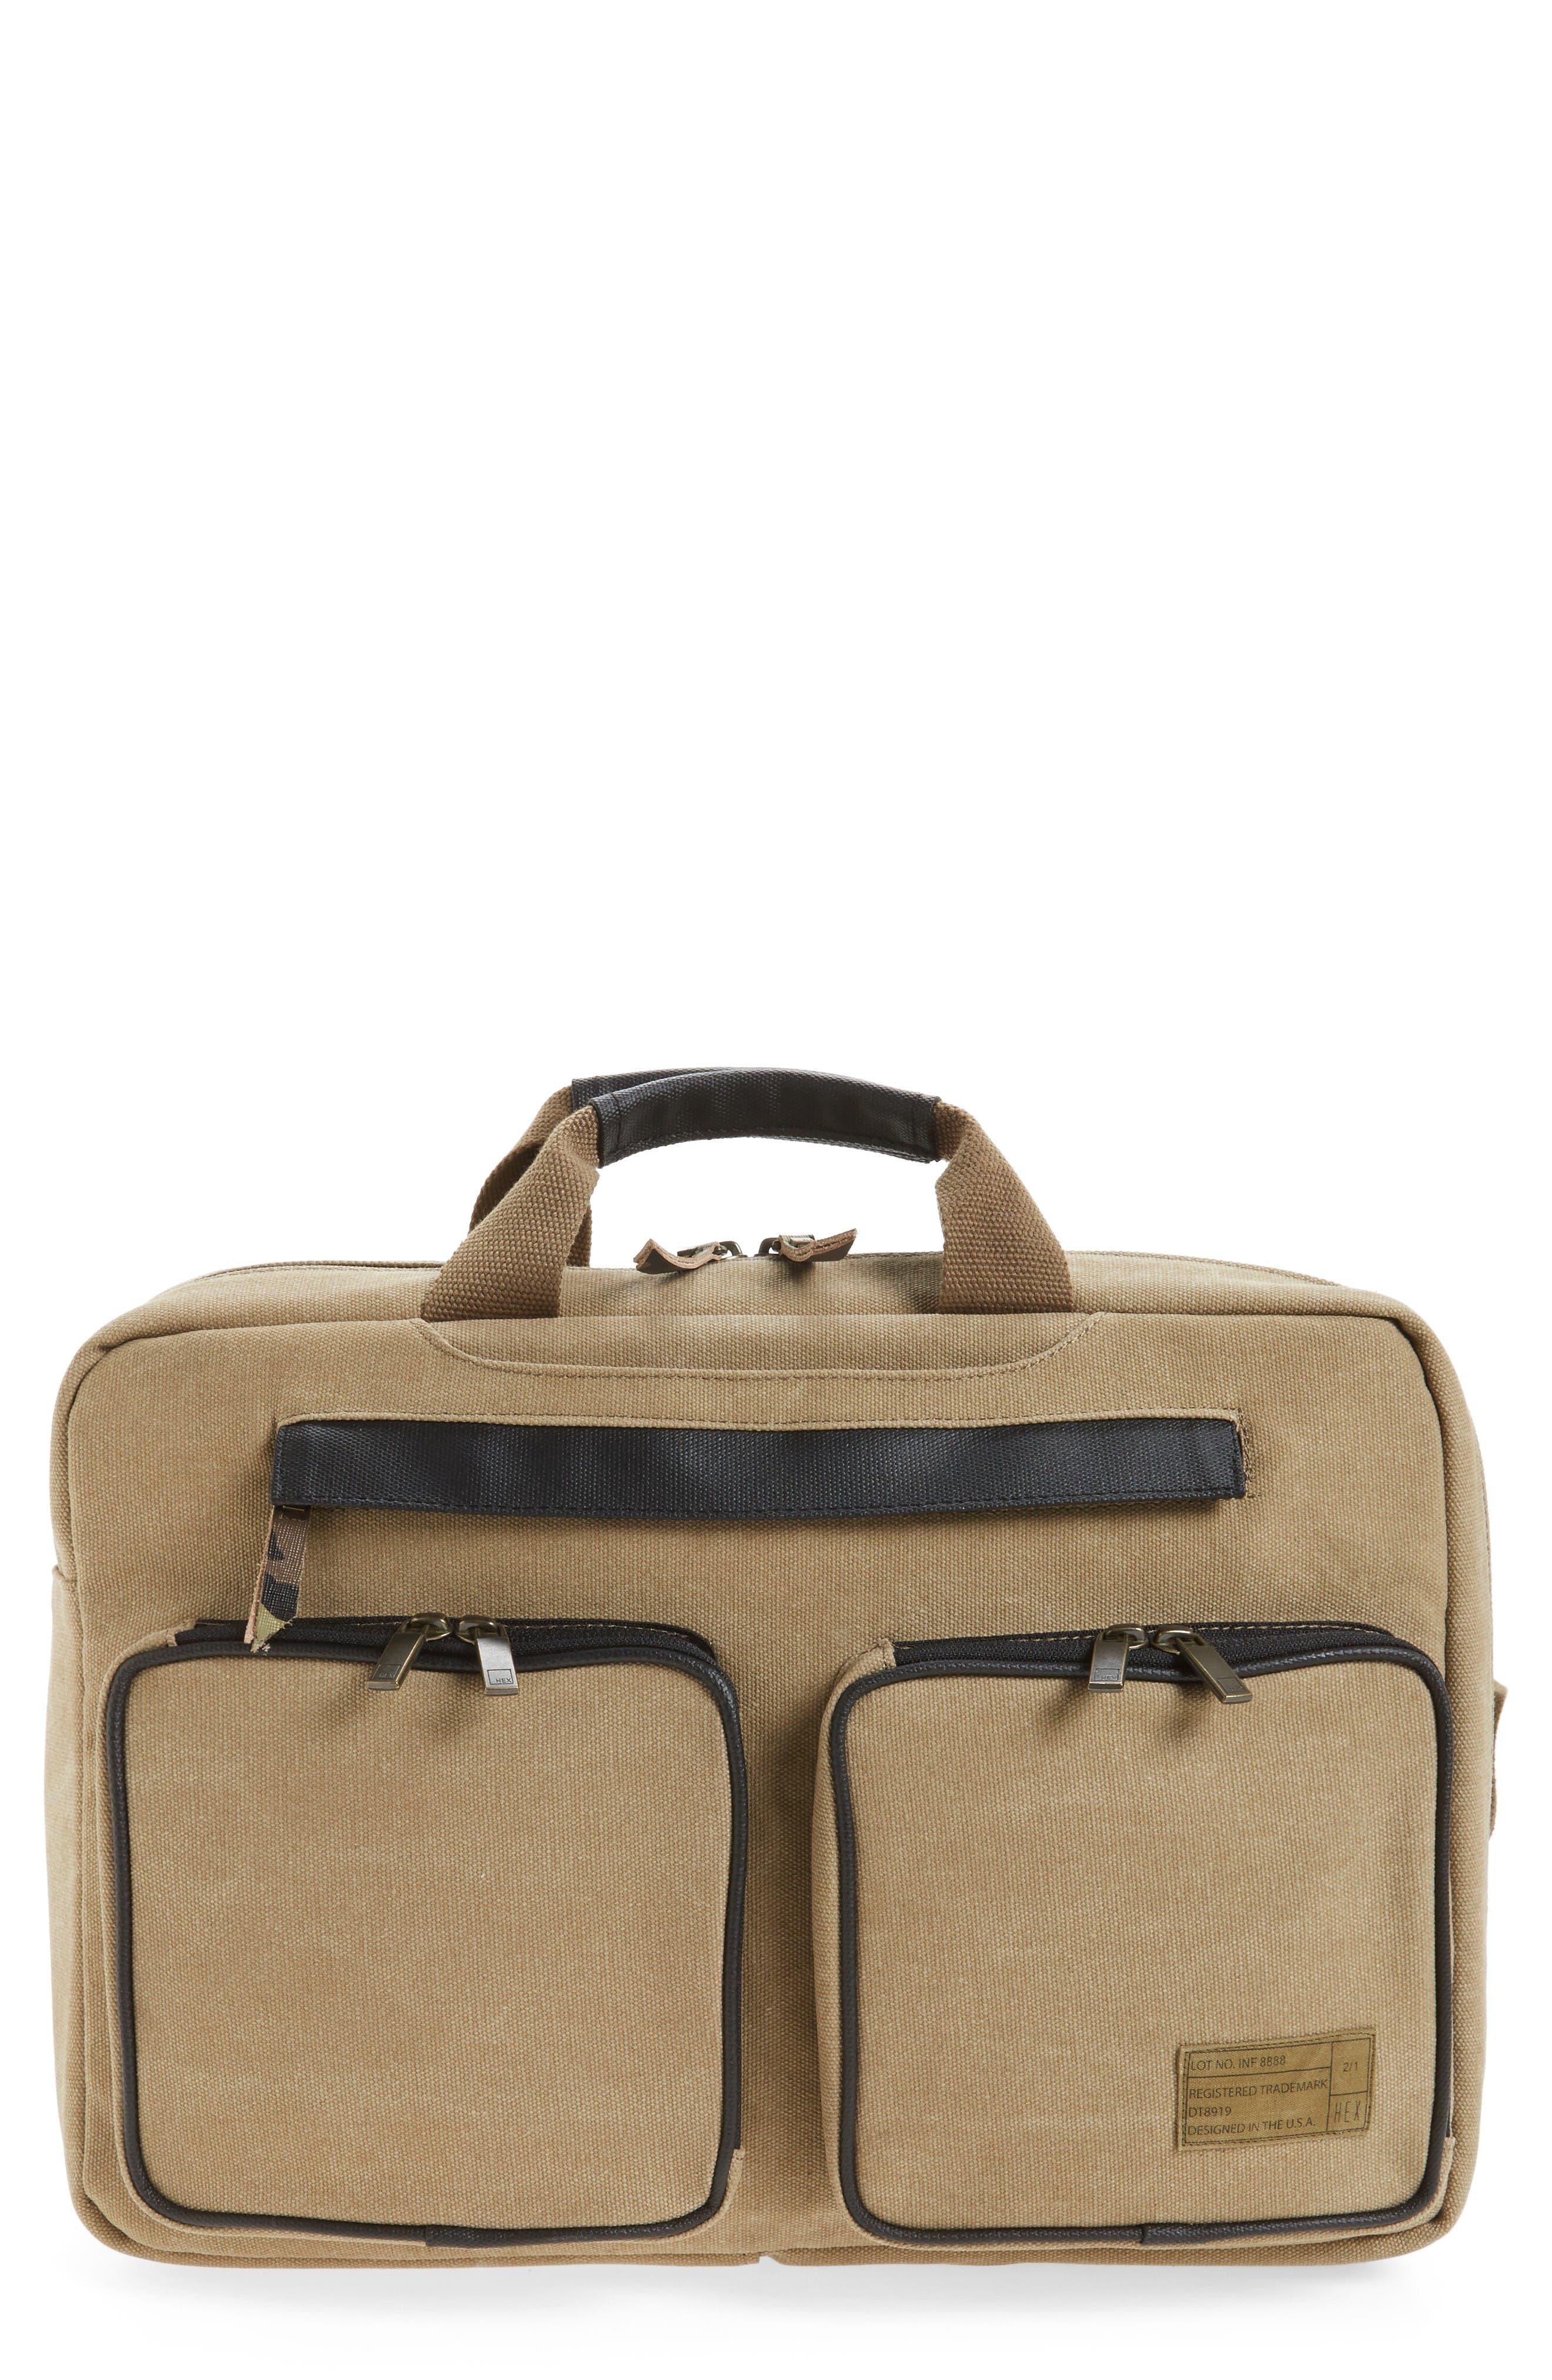 Radar Convertible Water Resistant Briefcase,                         Main,                         color, Khaki